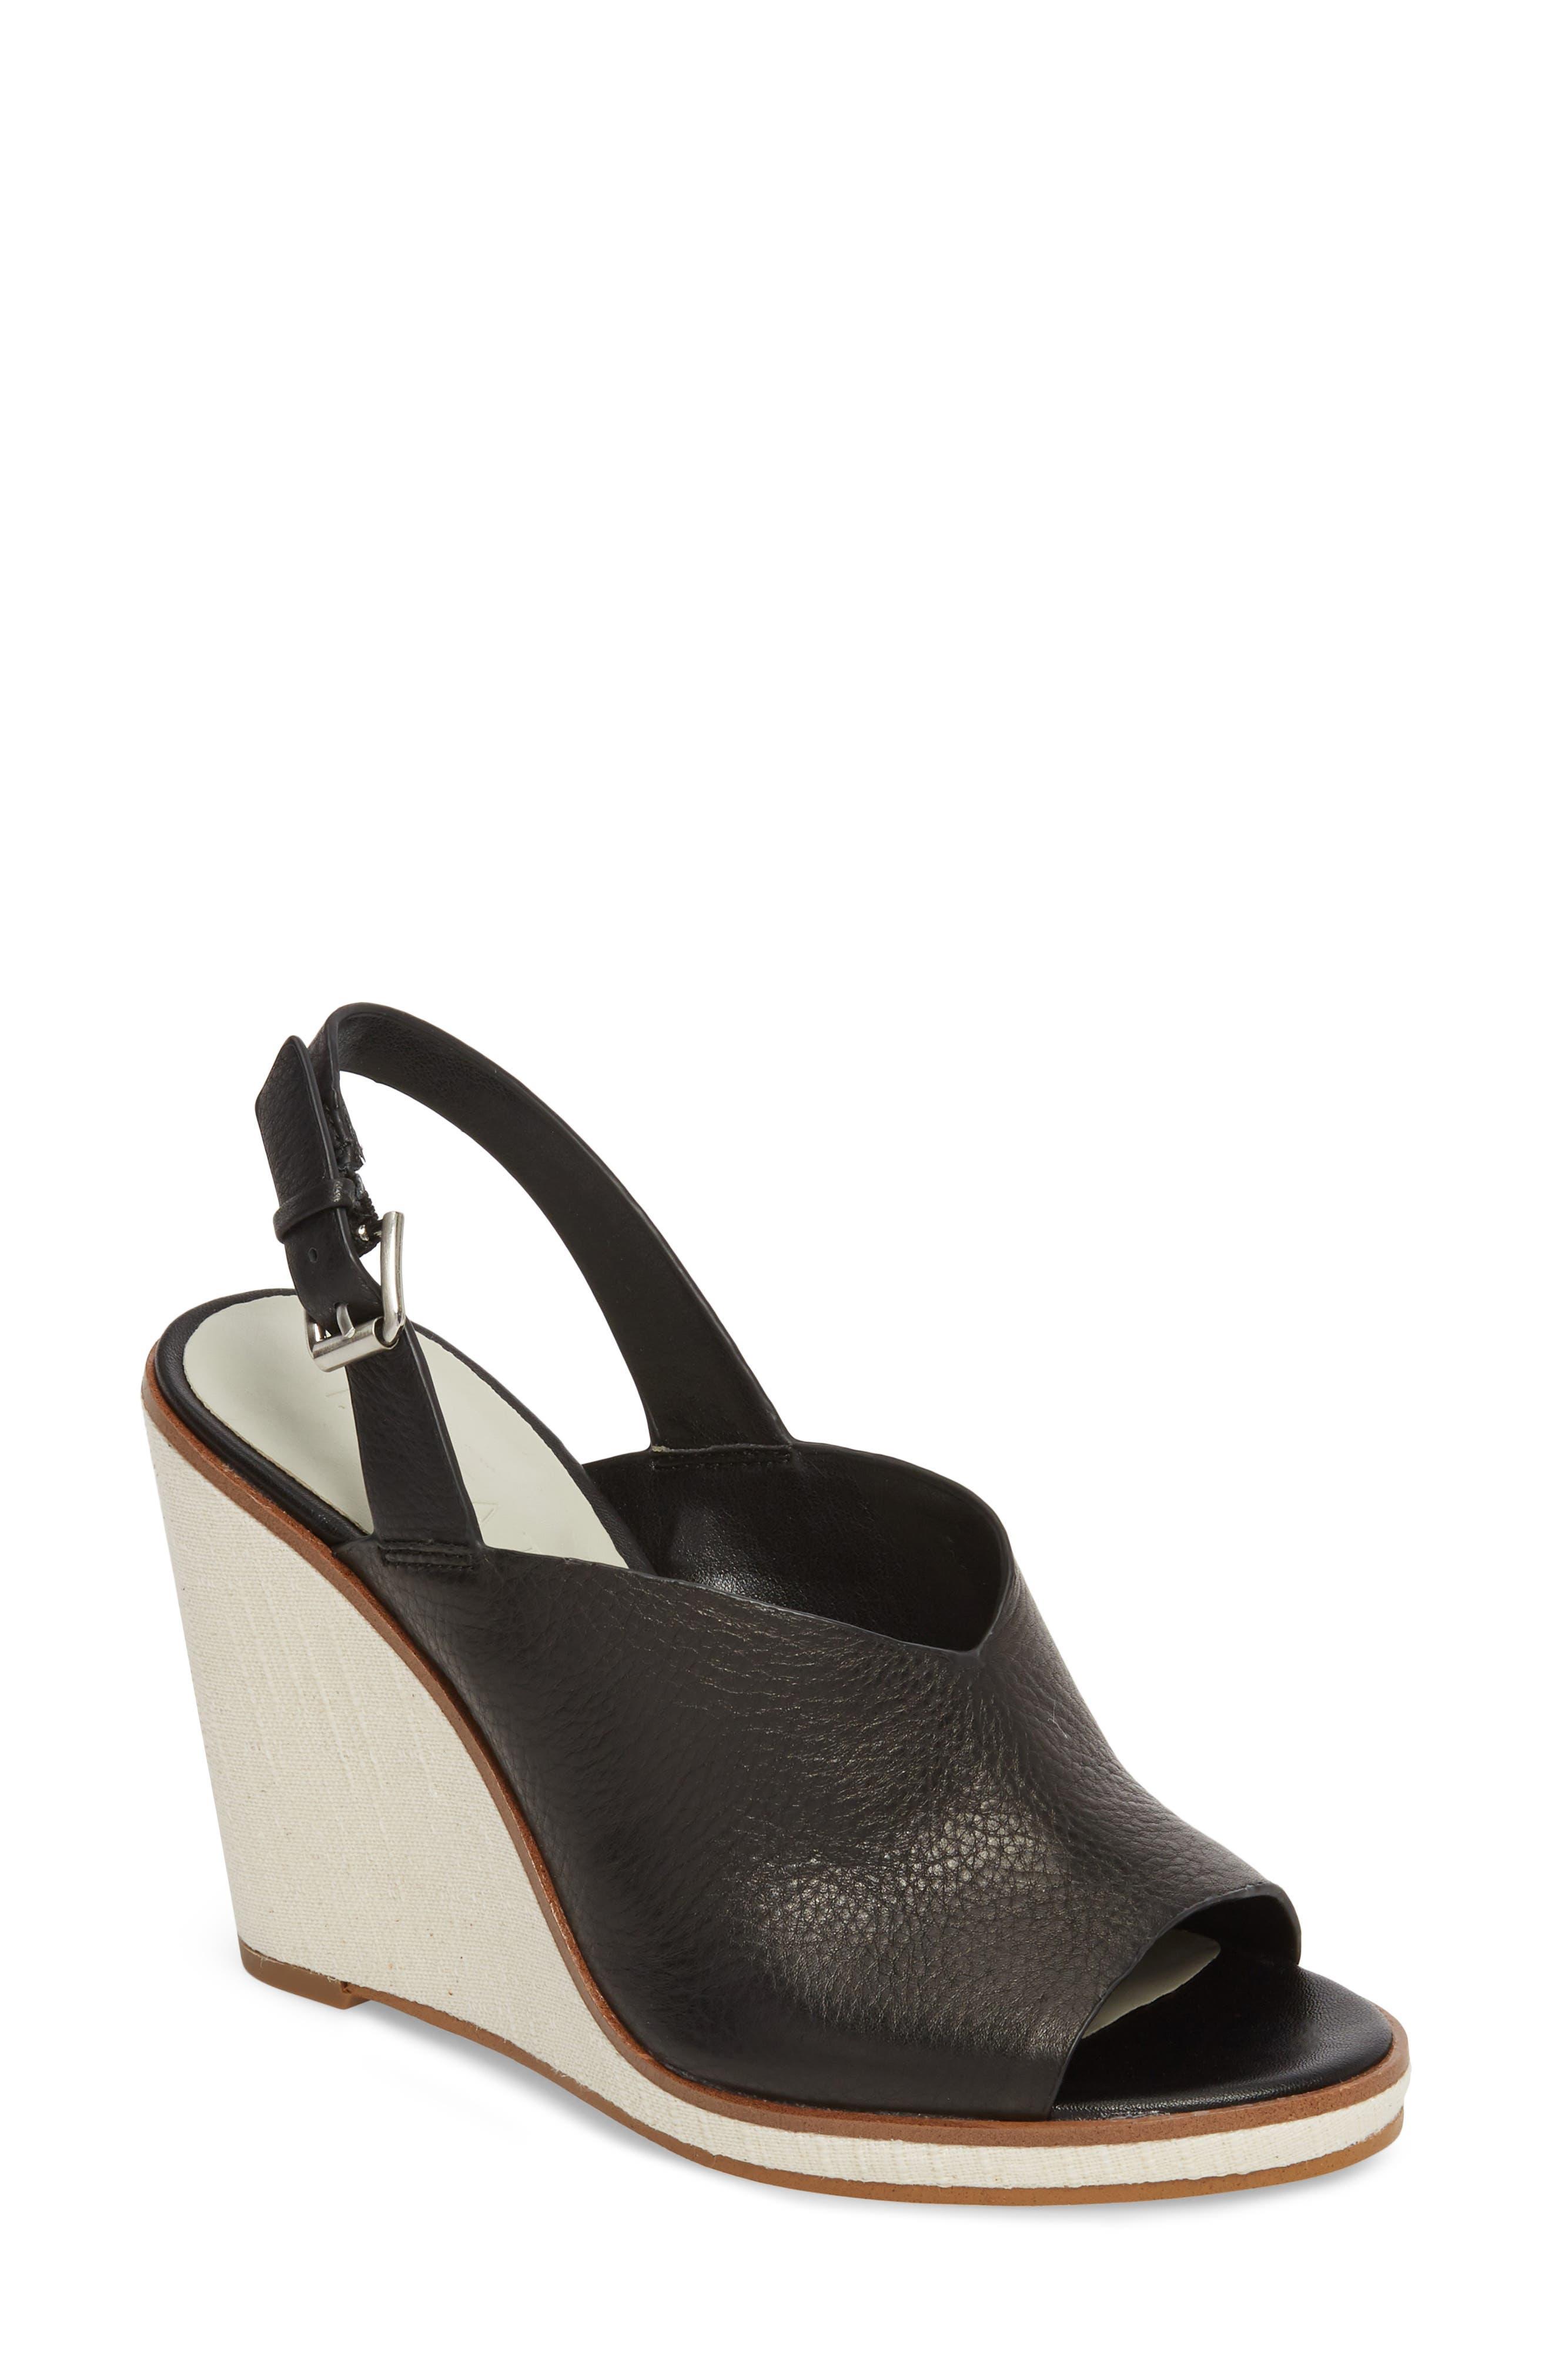 Genna Wedge Sandal, Main, color, BLACK LEATHER